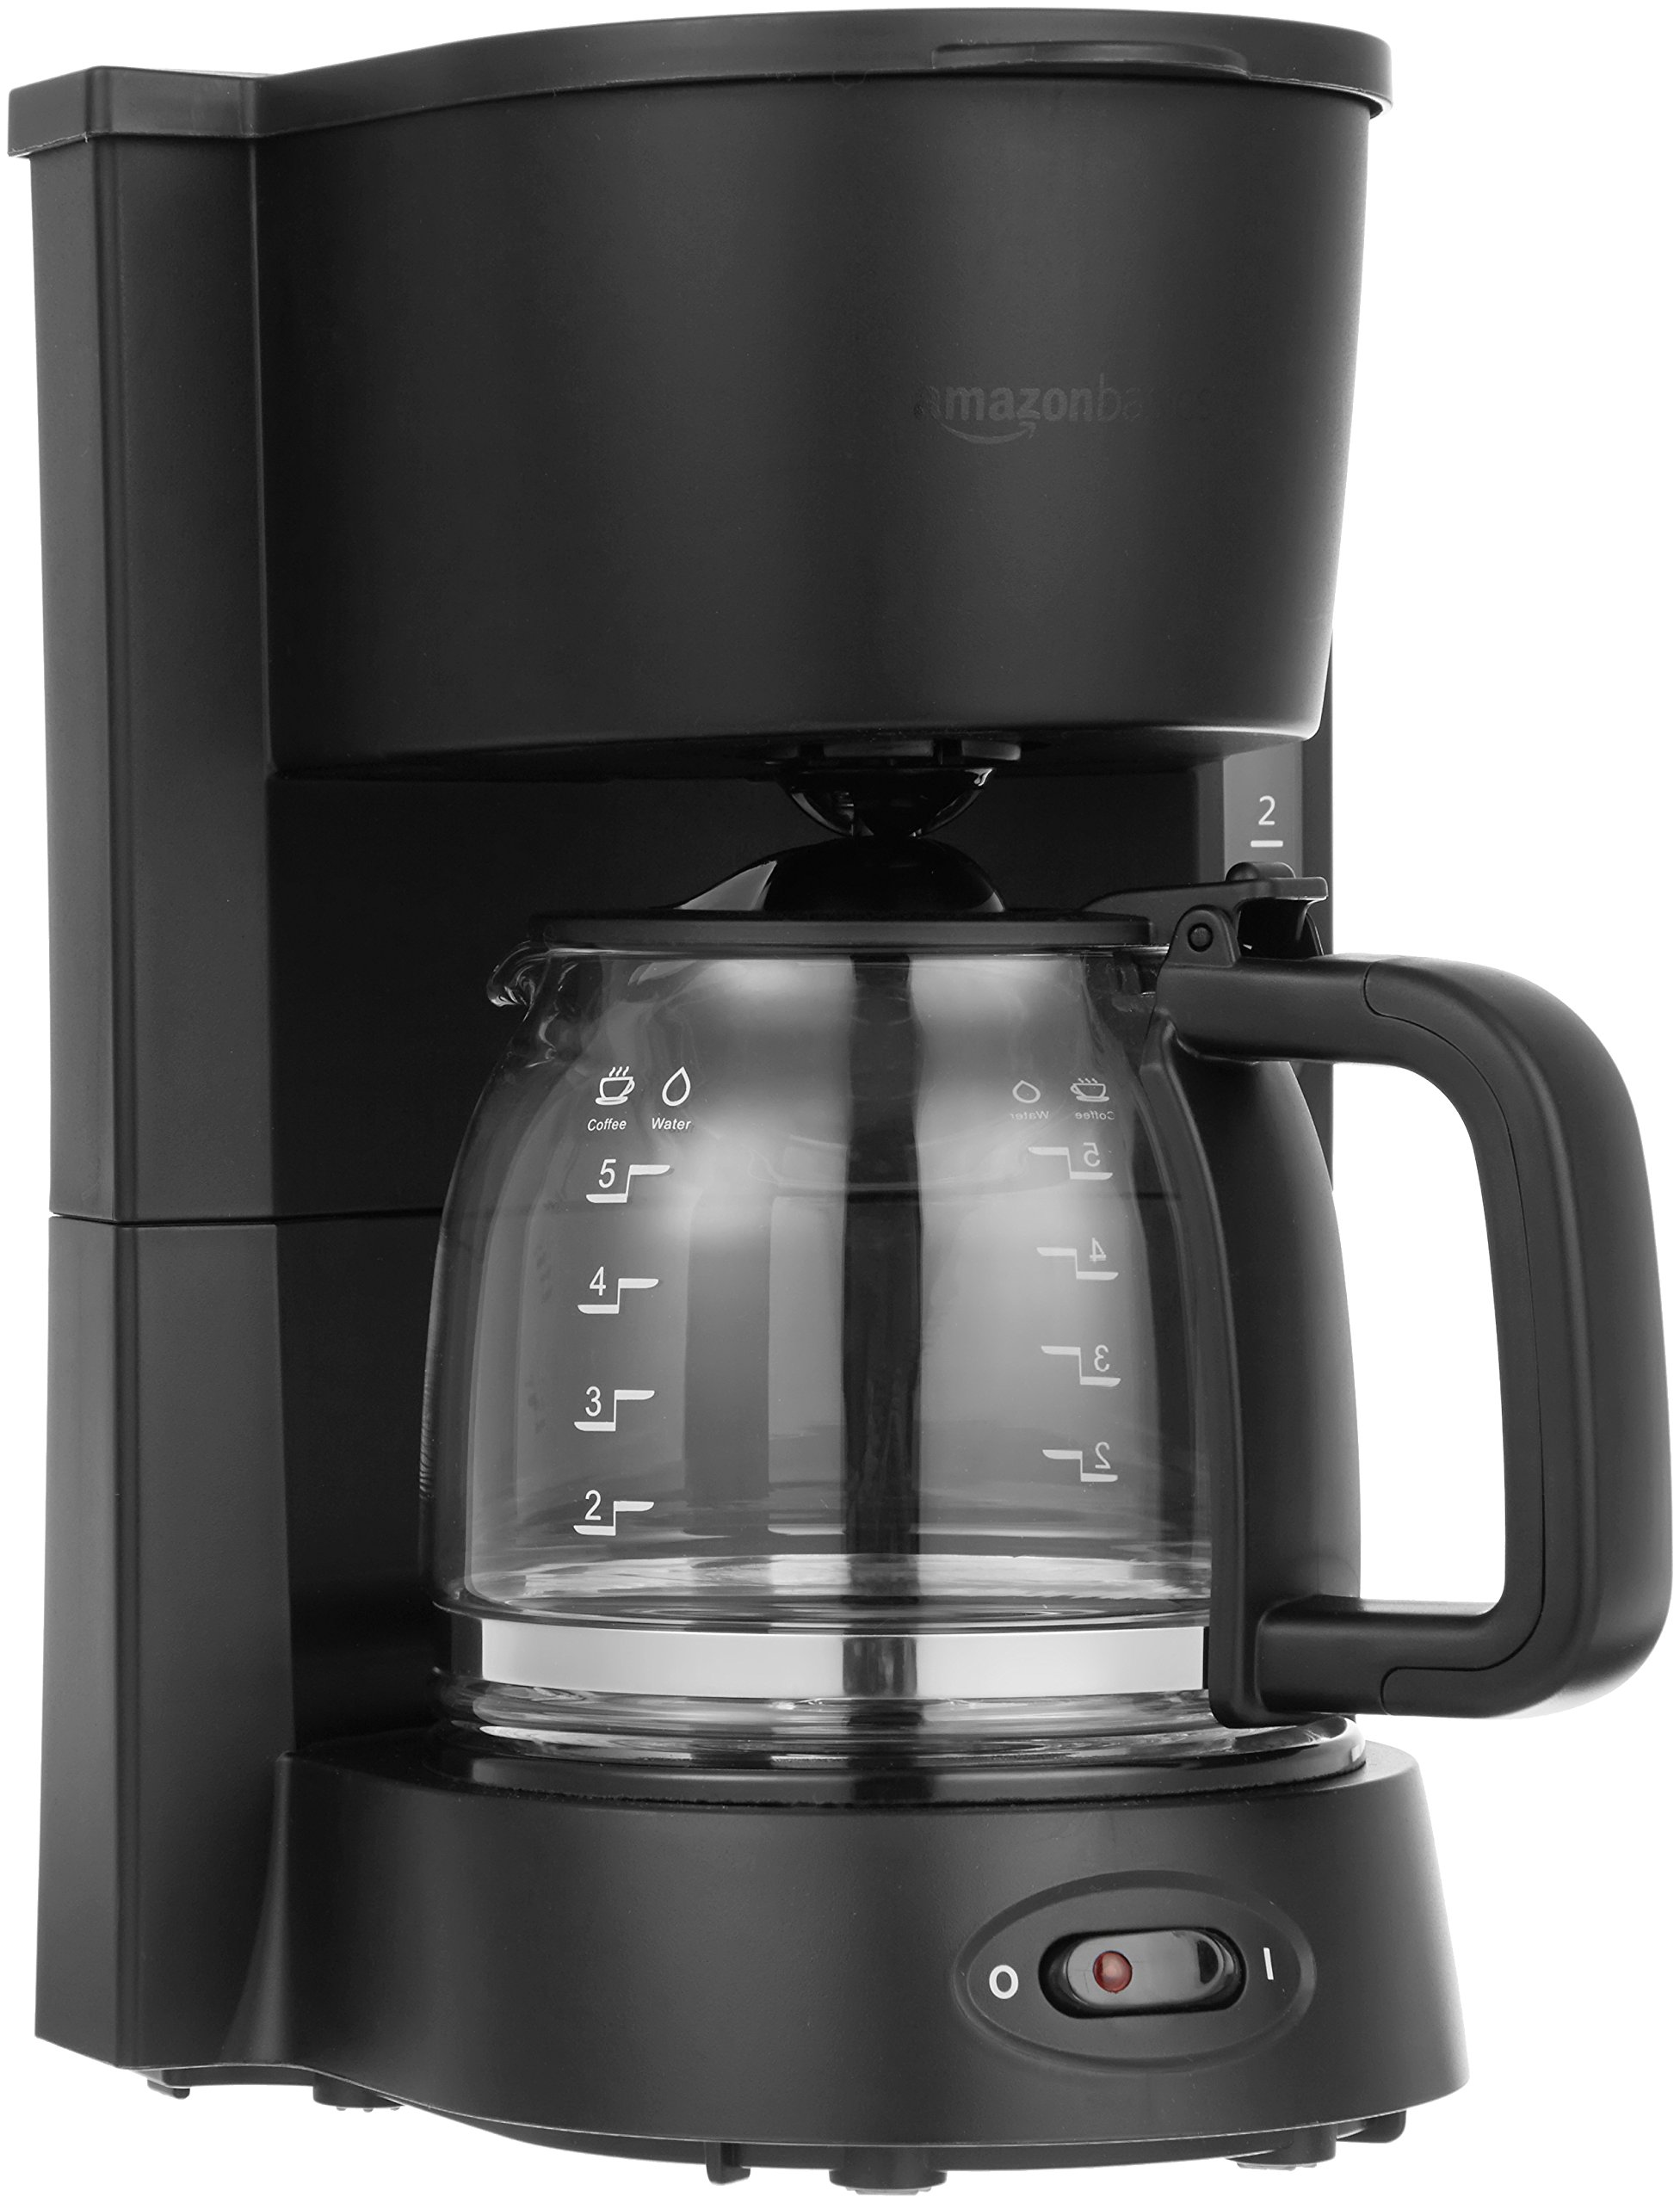 AmazonBasics Coffee Maker Glass Carafe